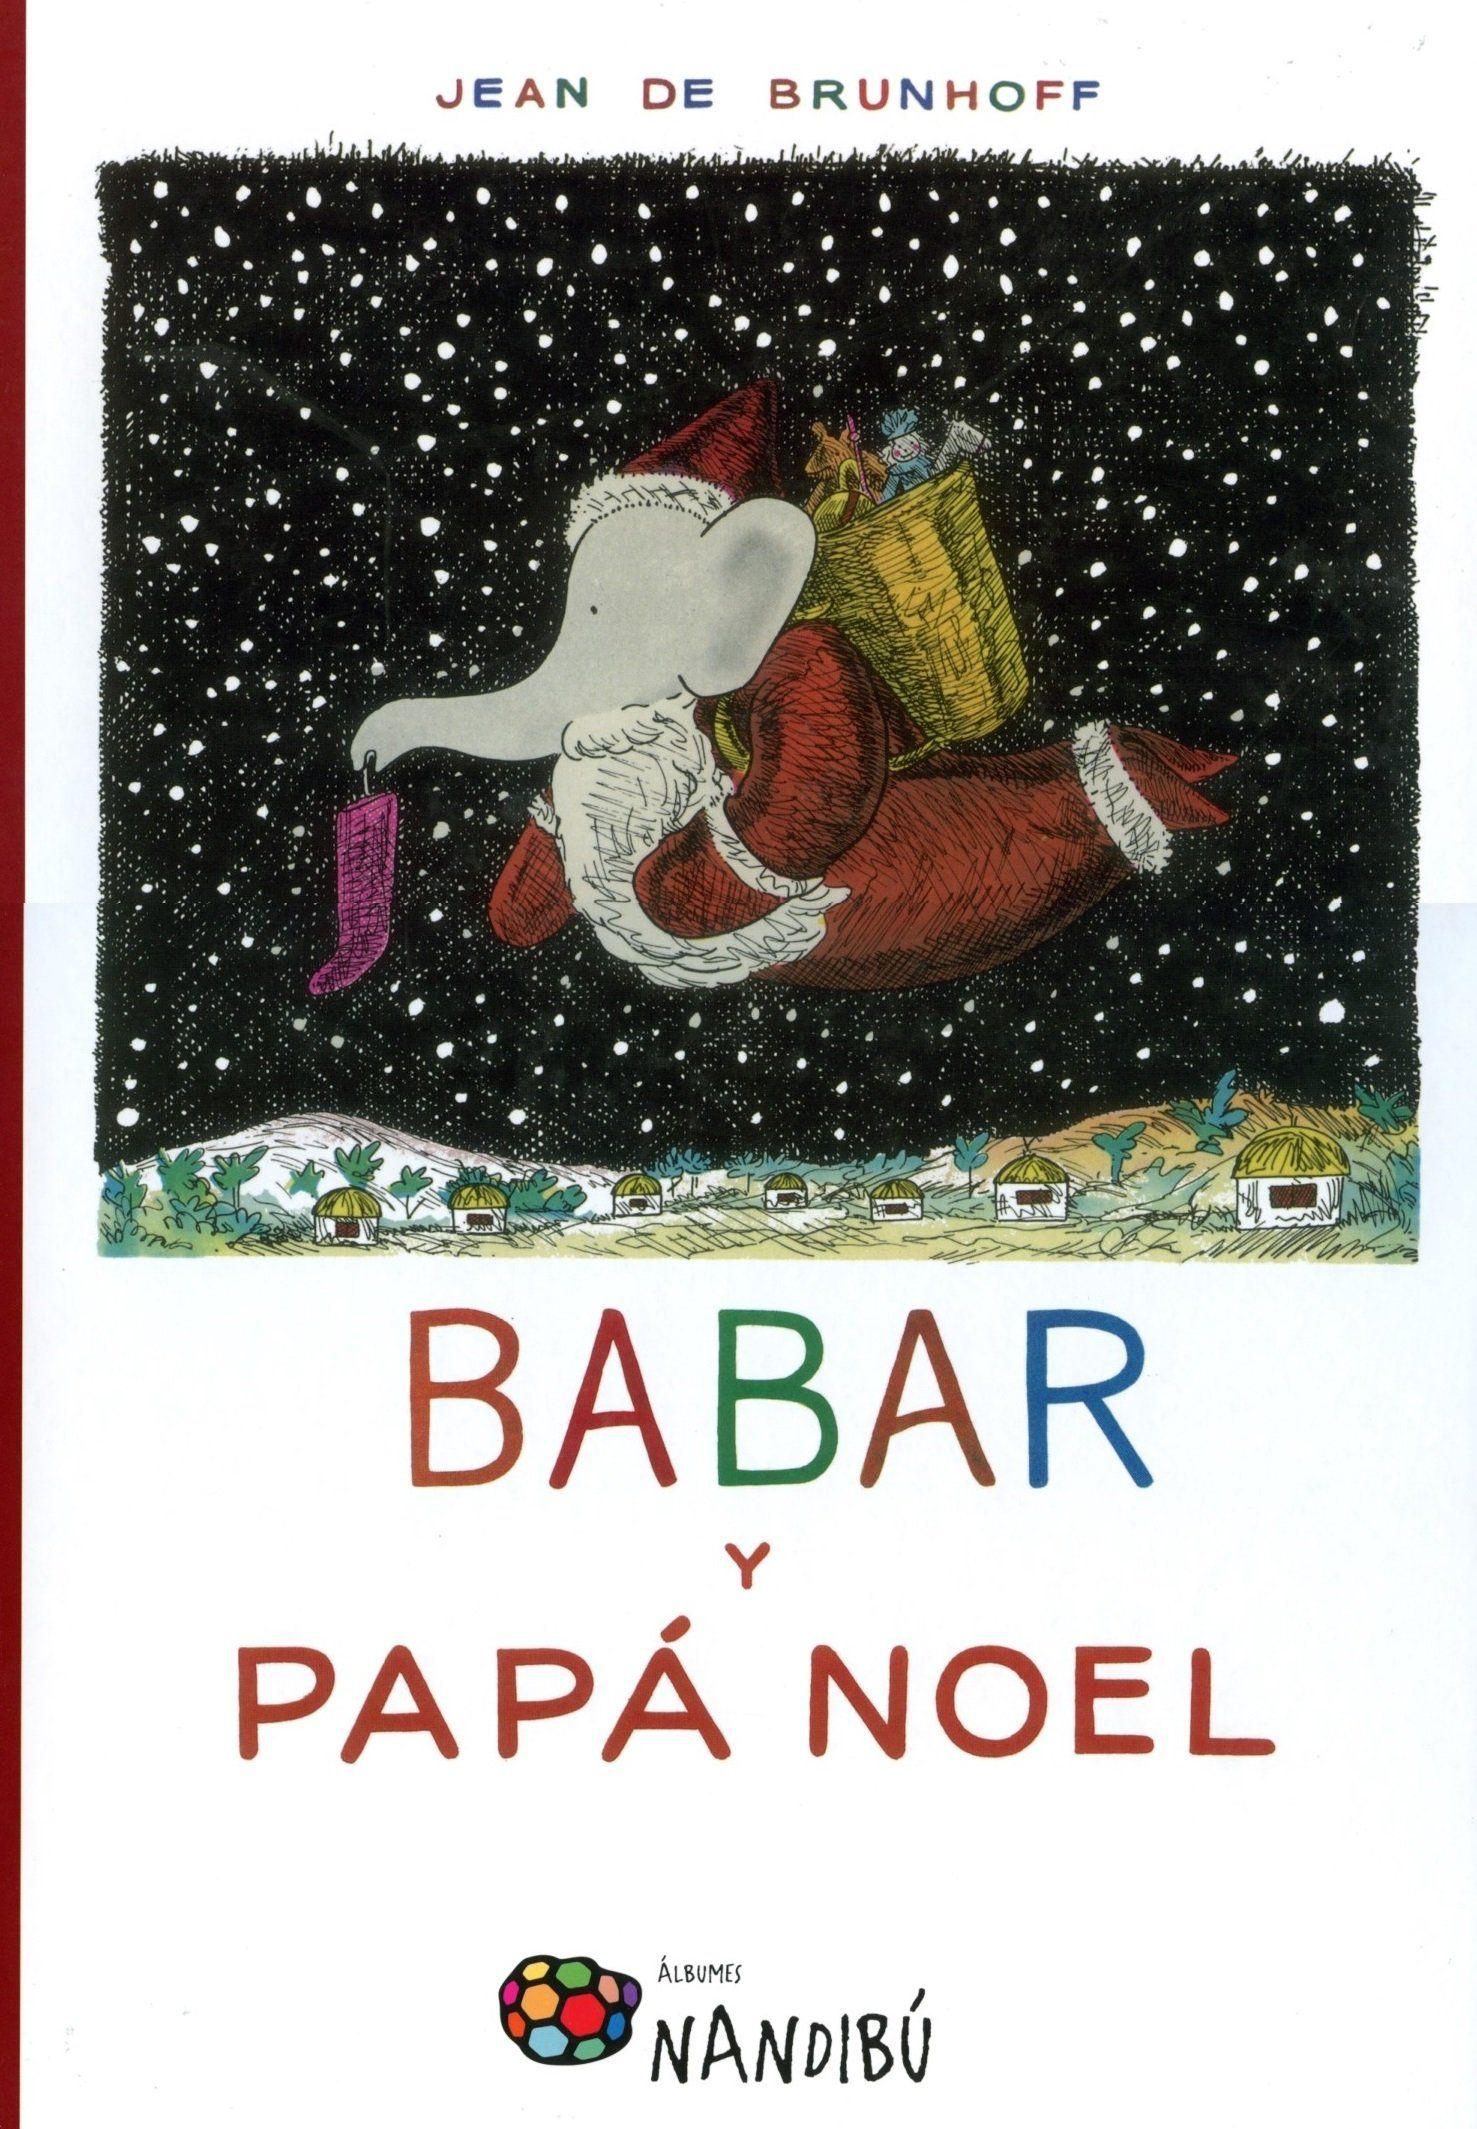 Babar y Papá Noel, Jean de Brunhoff